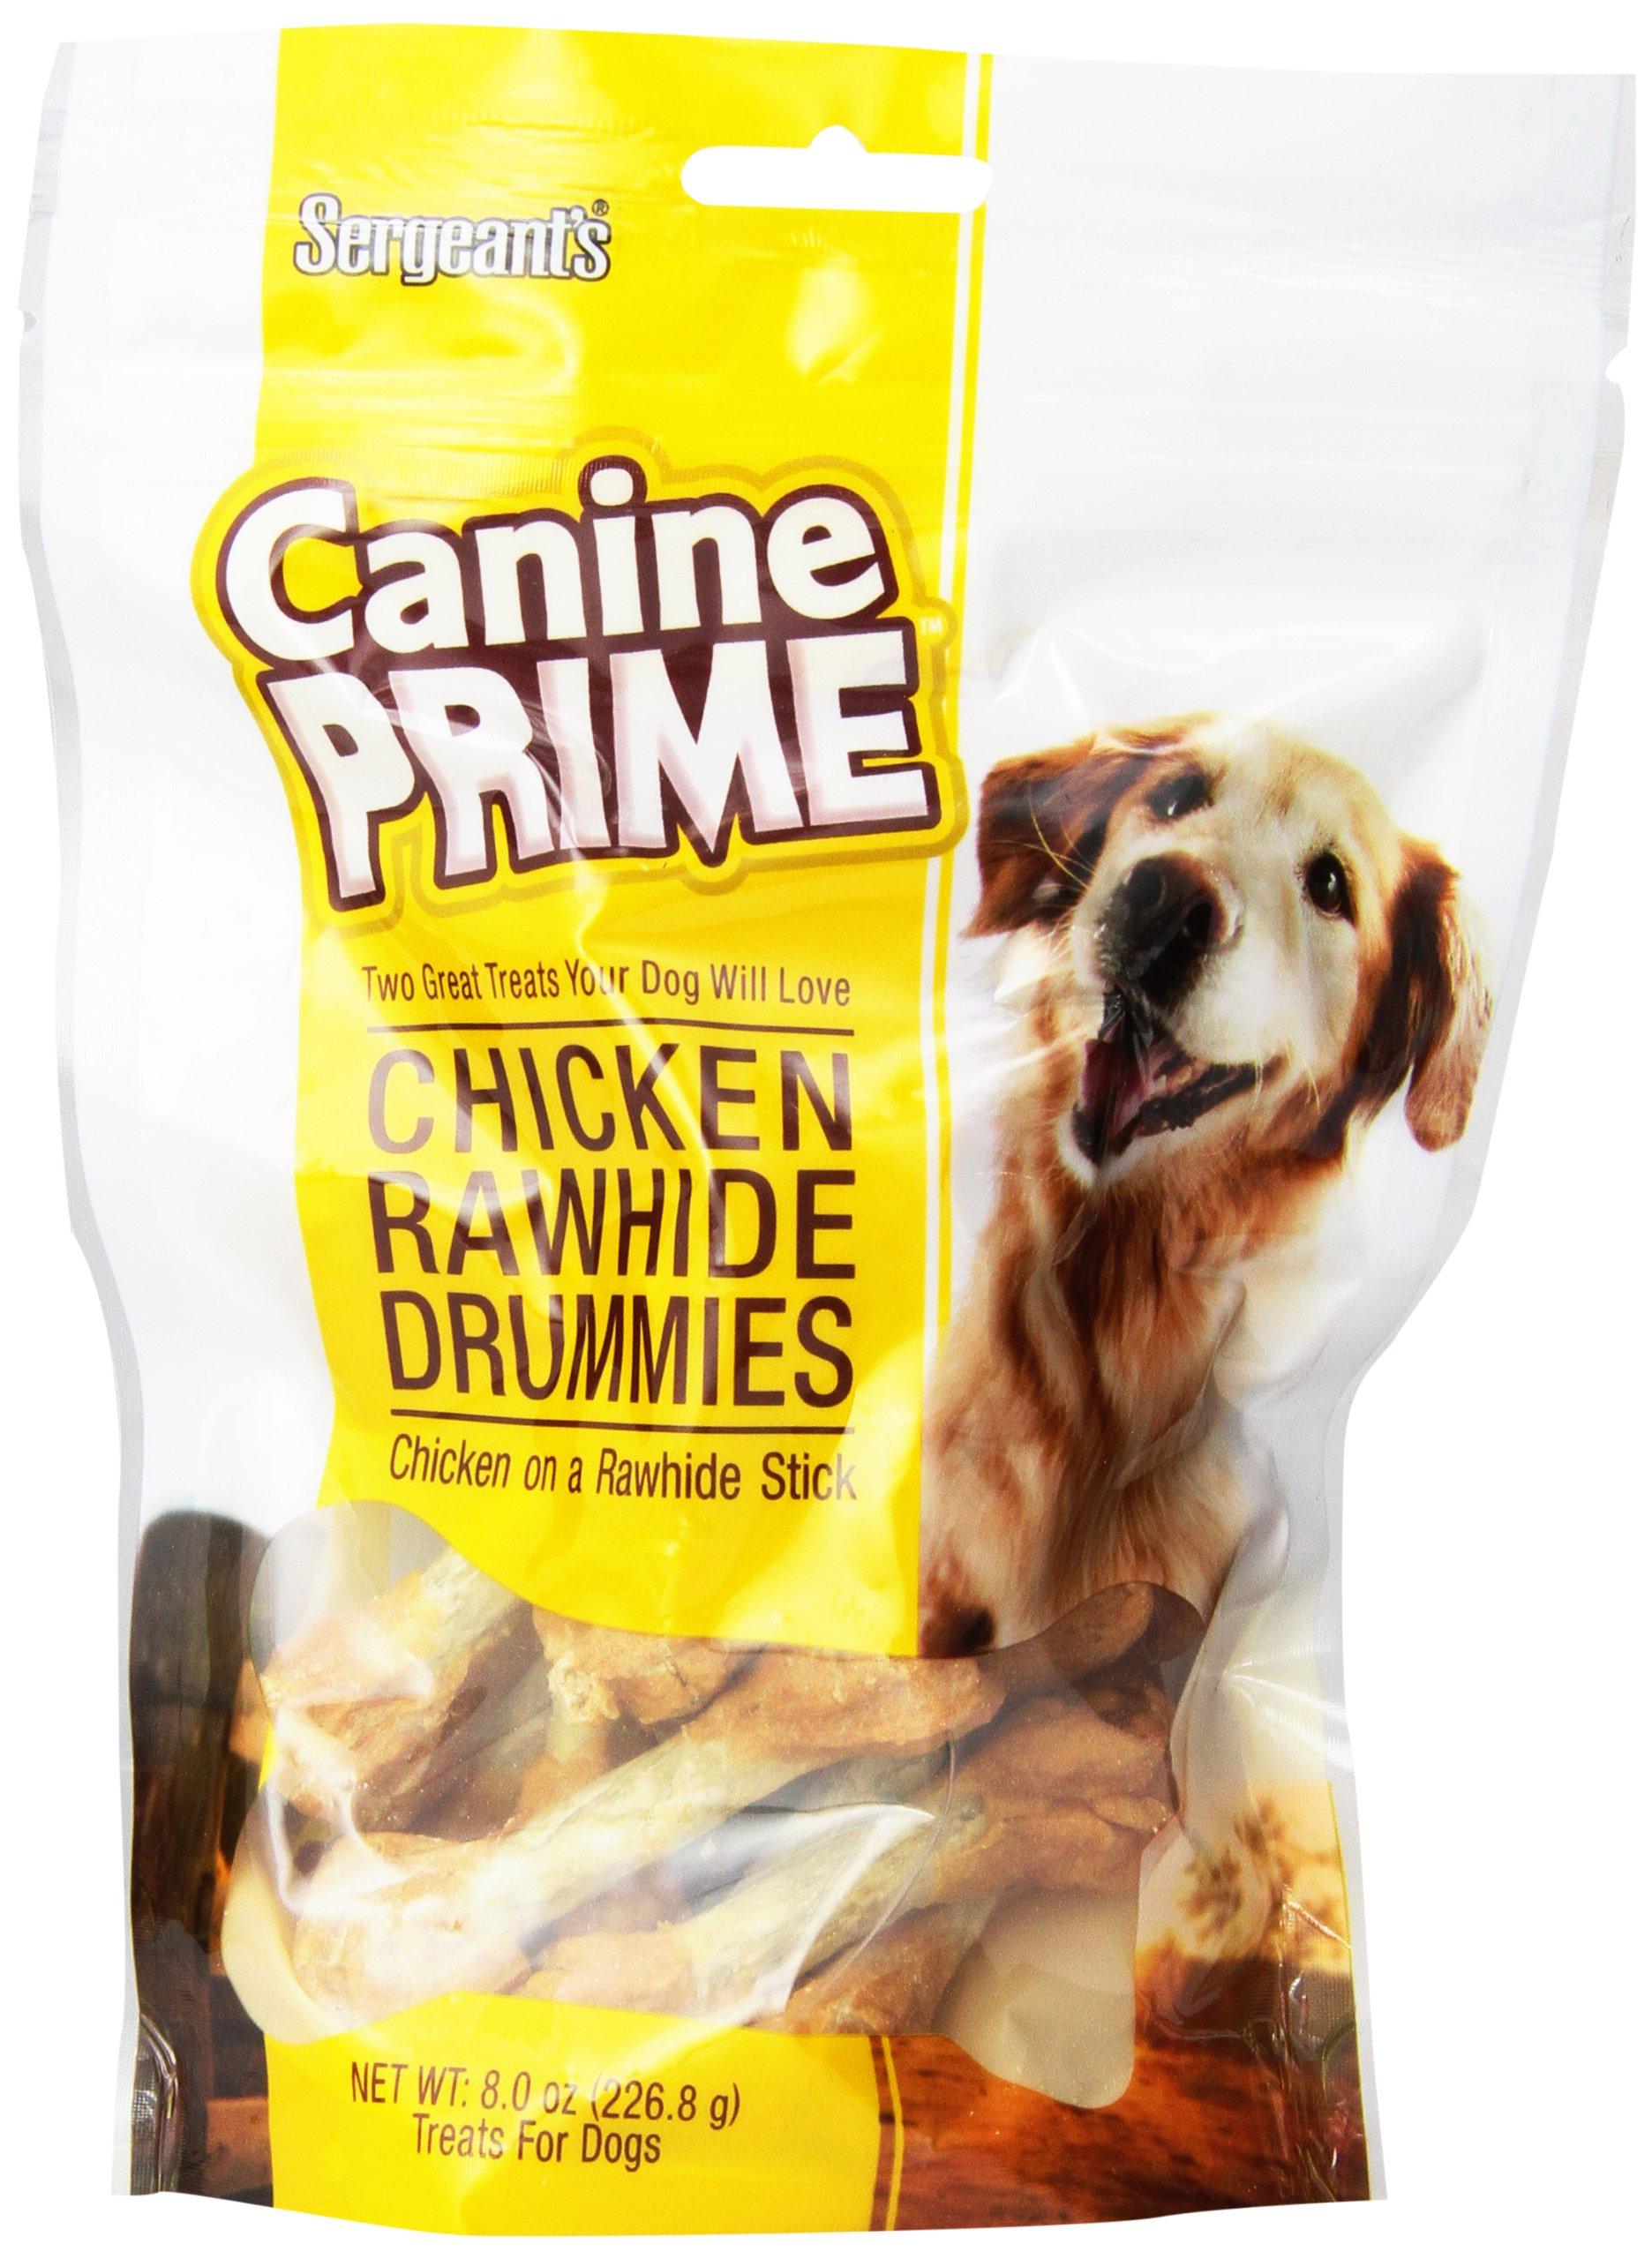 Sergeant's Canine Prime Chicken Drummies Pet Food